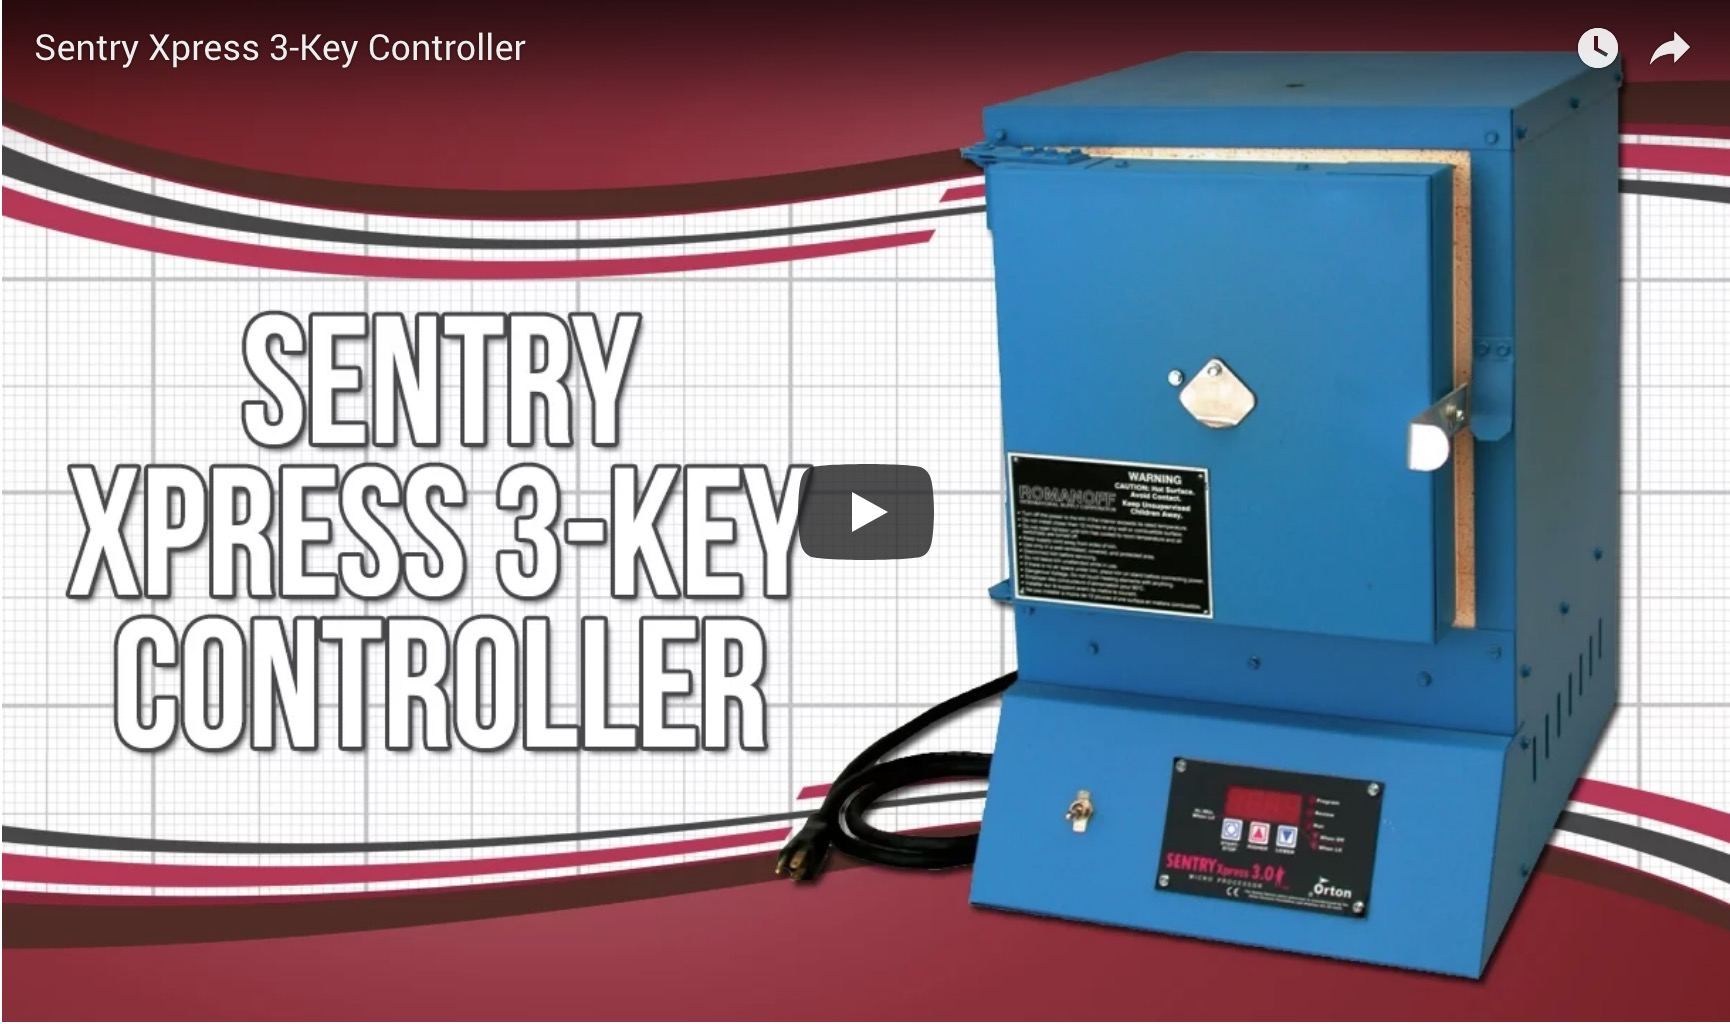 Sentry Xpress 3-Key Controller